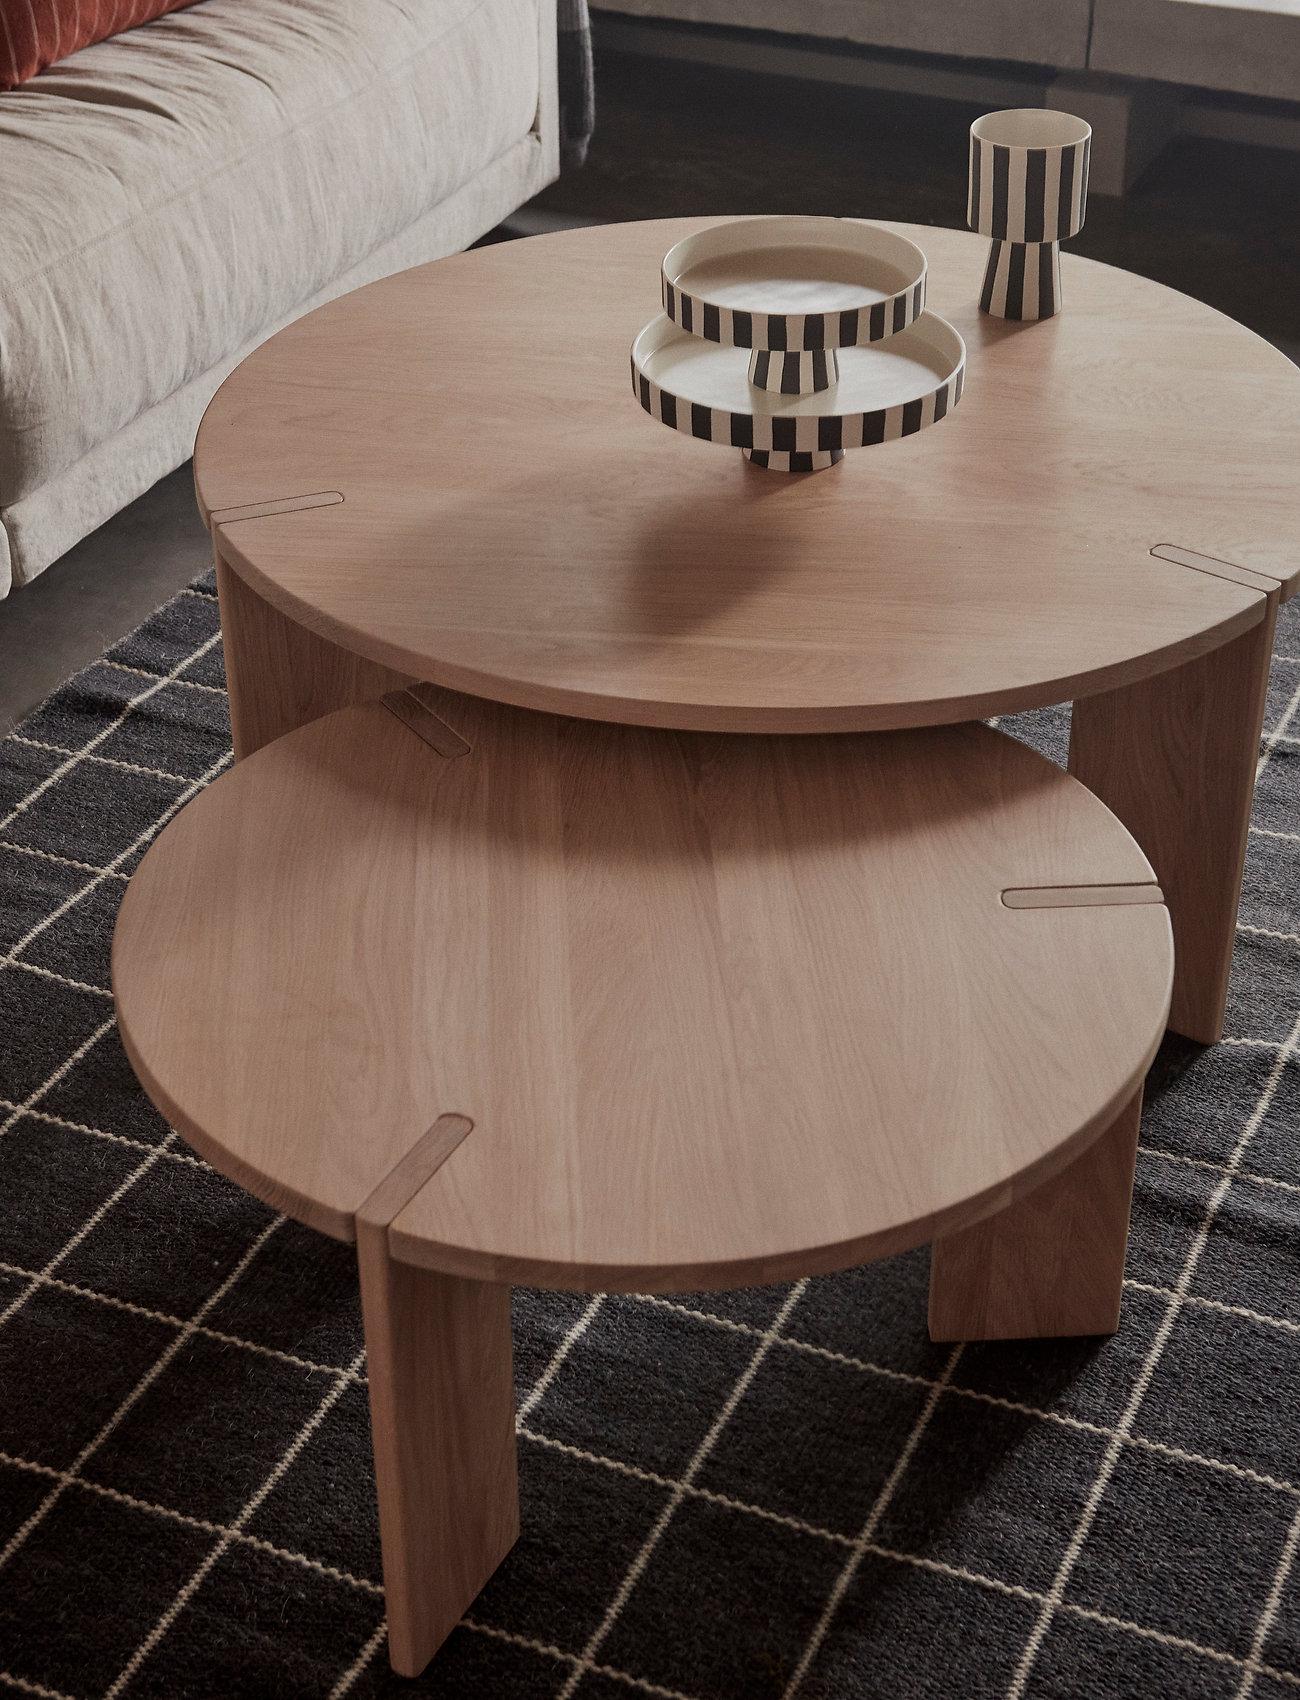 OYOY Living Design - Toppu Tray - kakefat - white / black - 1